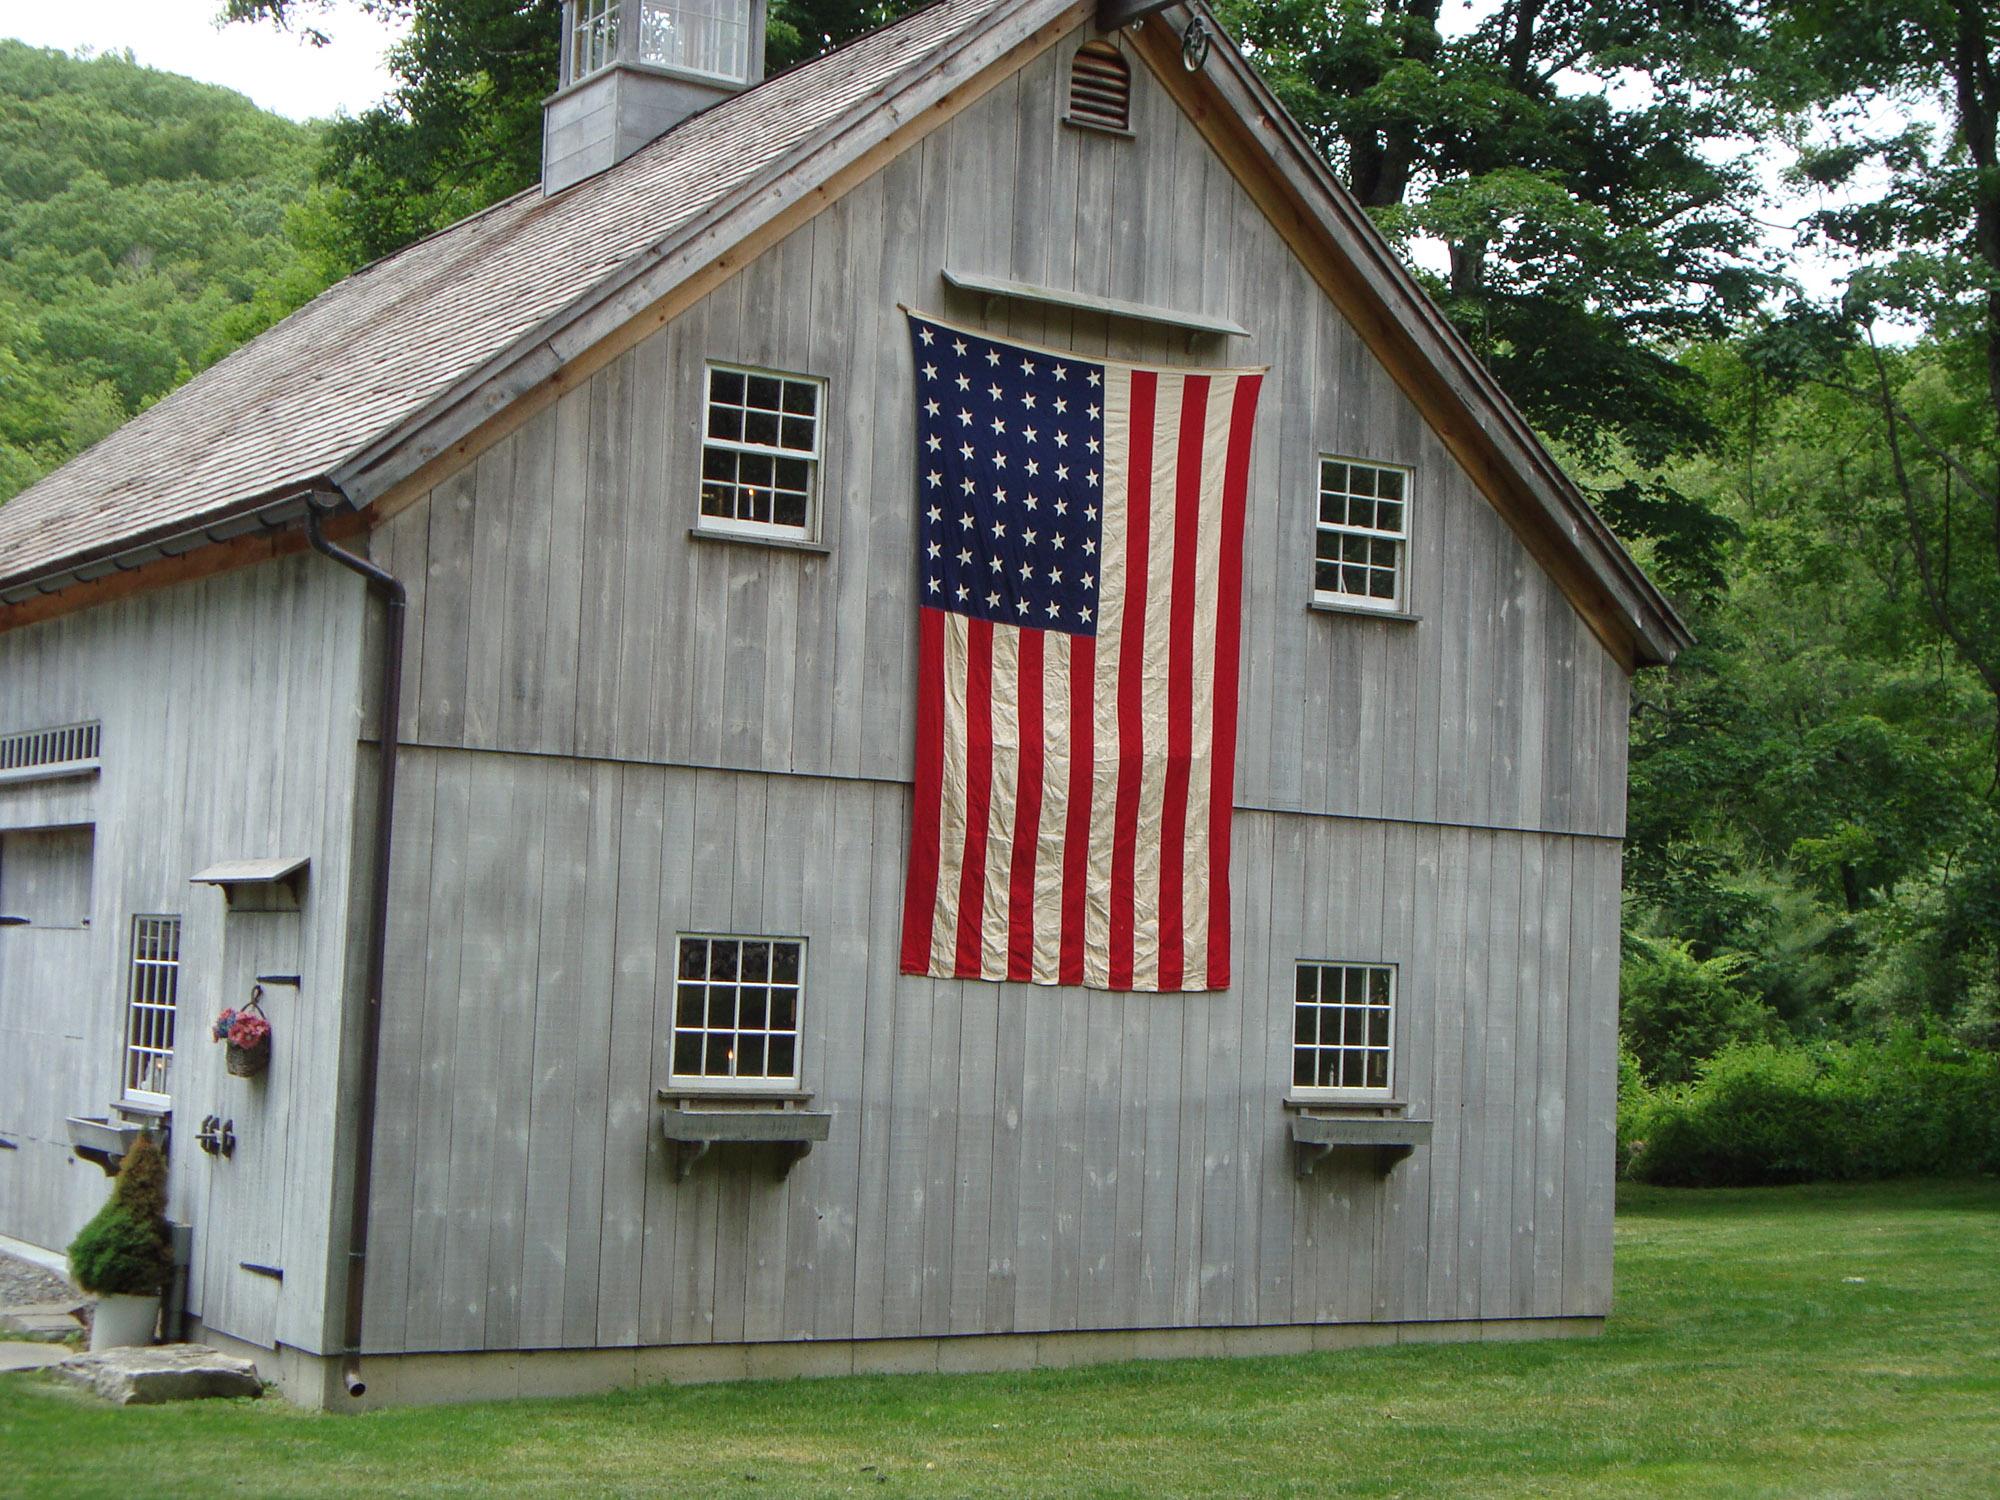 Barn_Memorial_Day